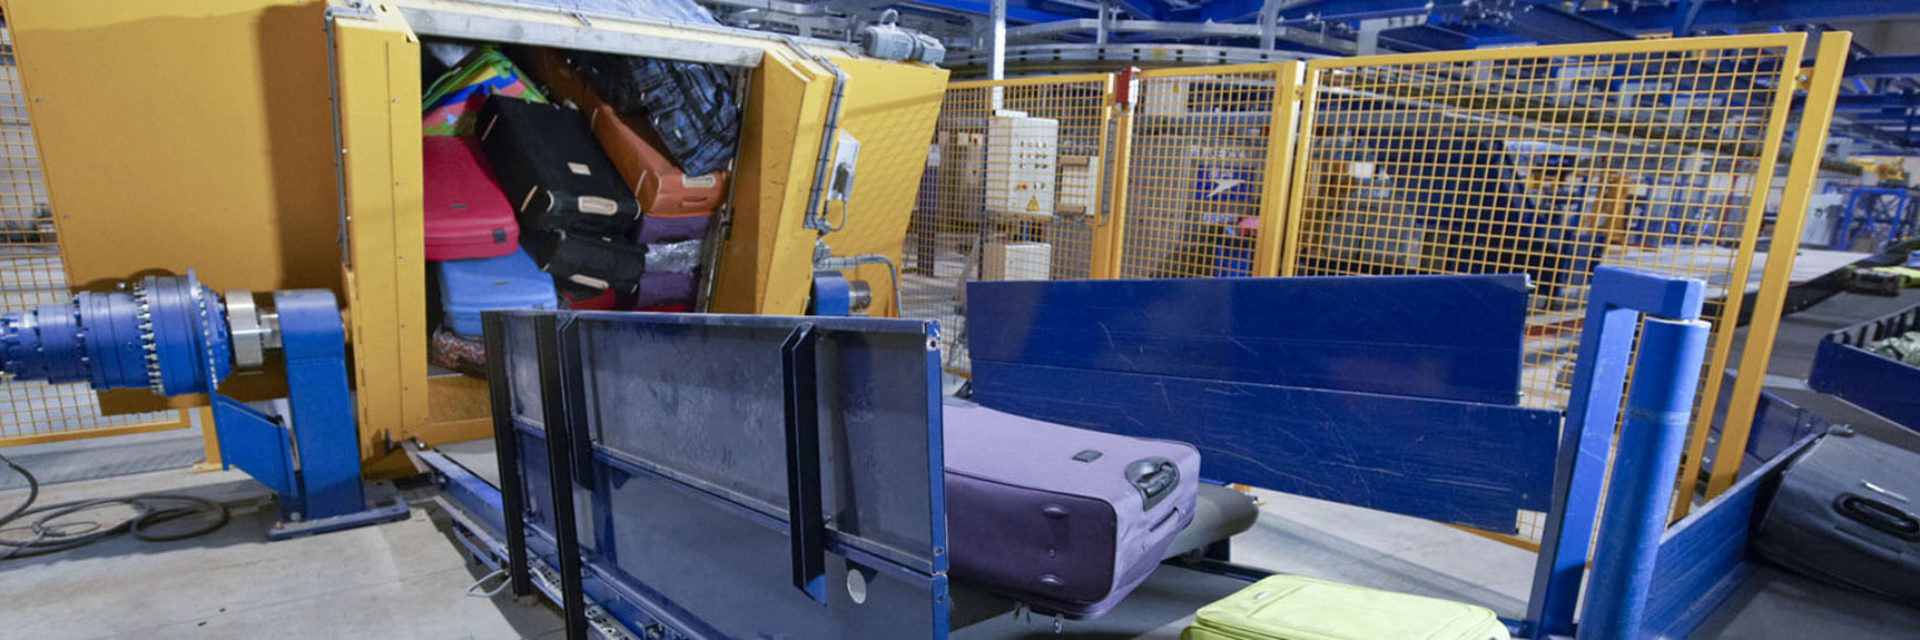 Automatisierte Container Entlader